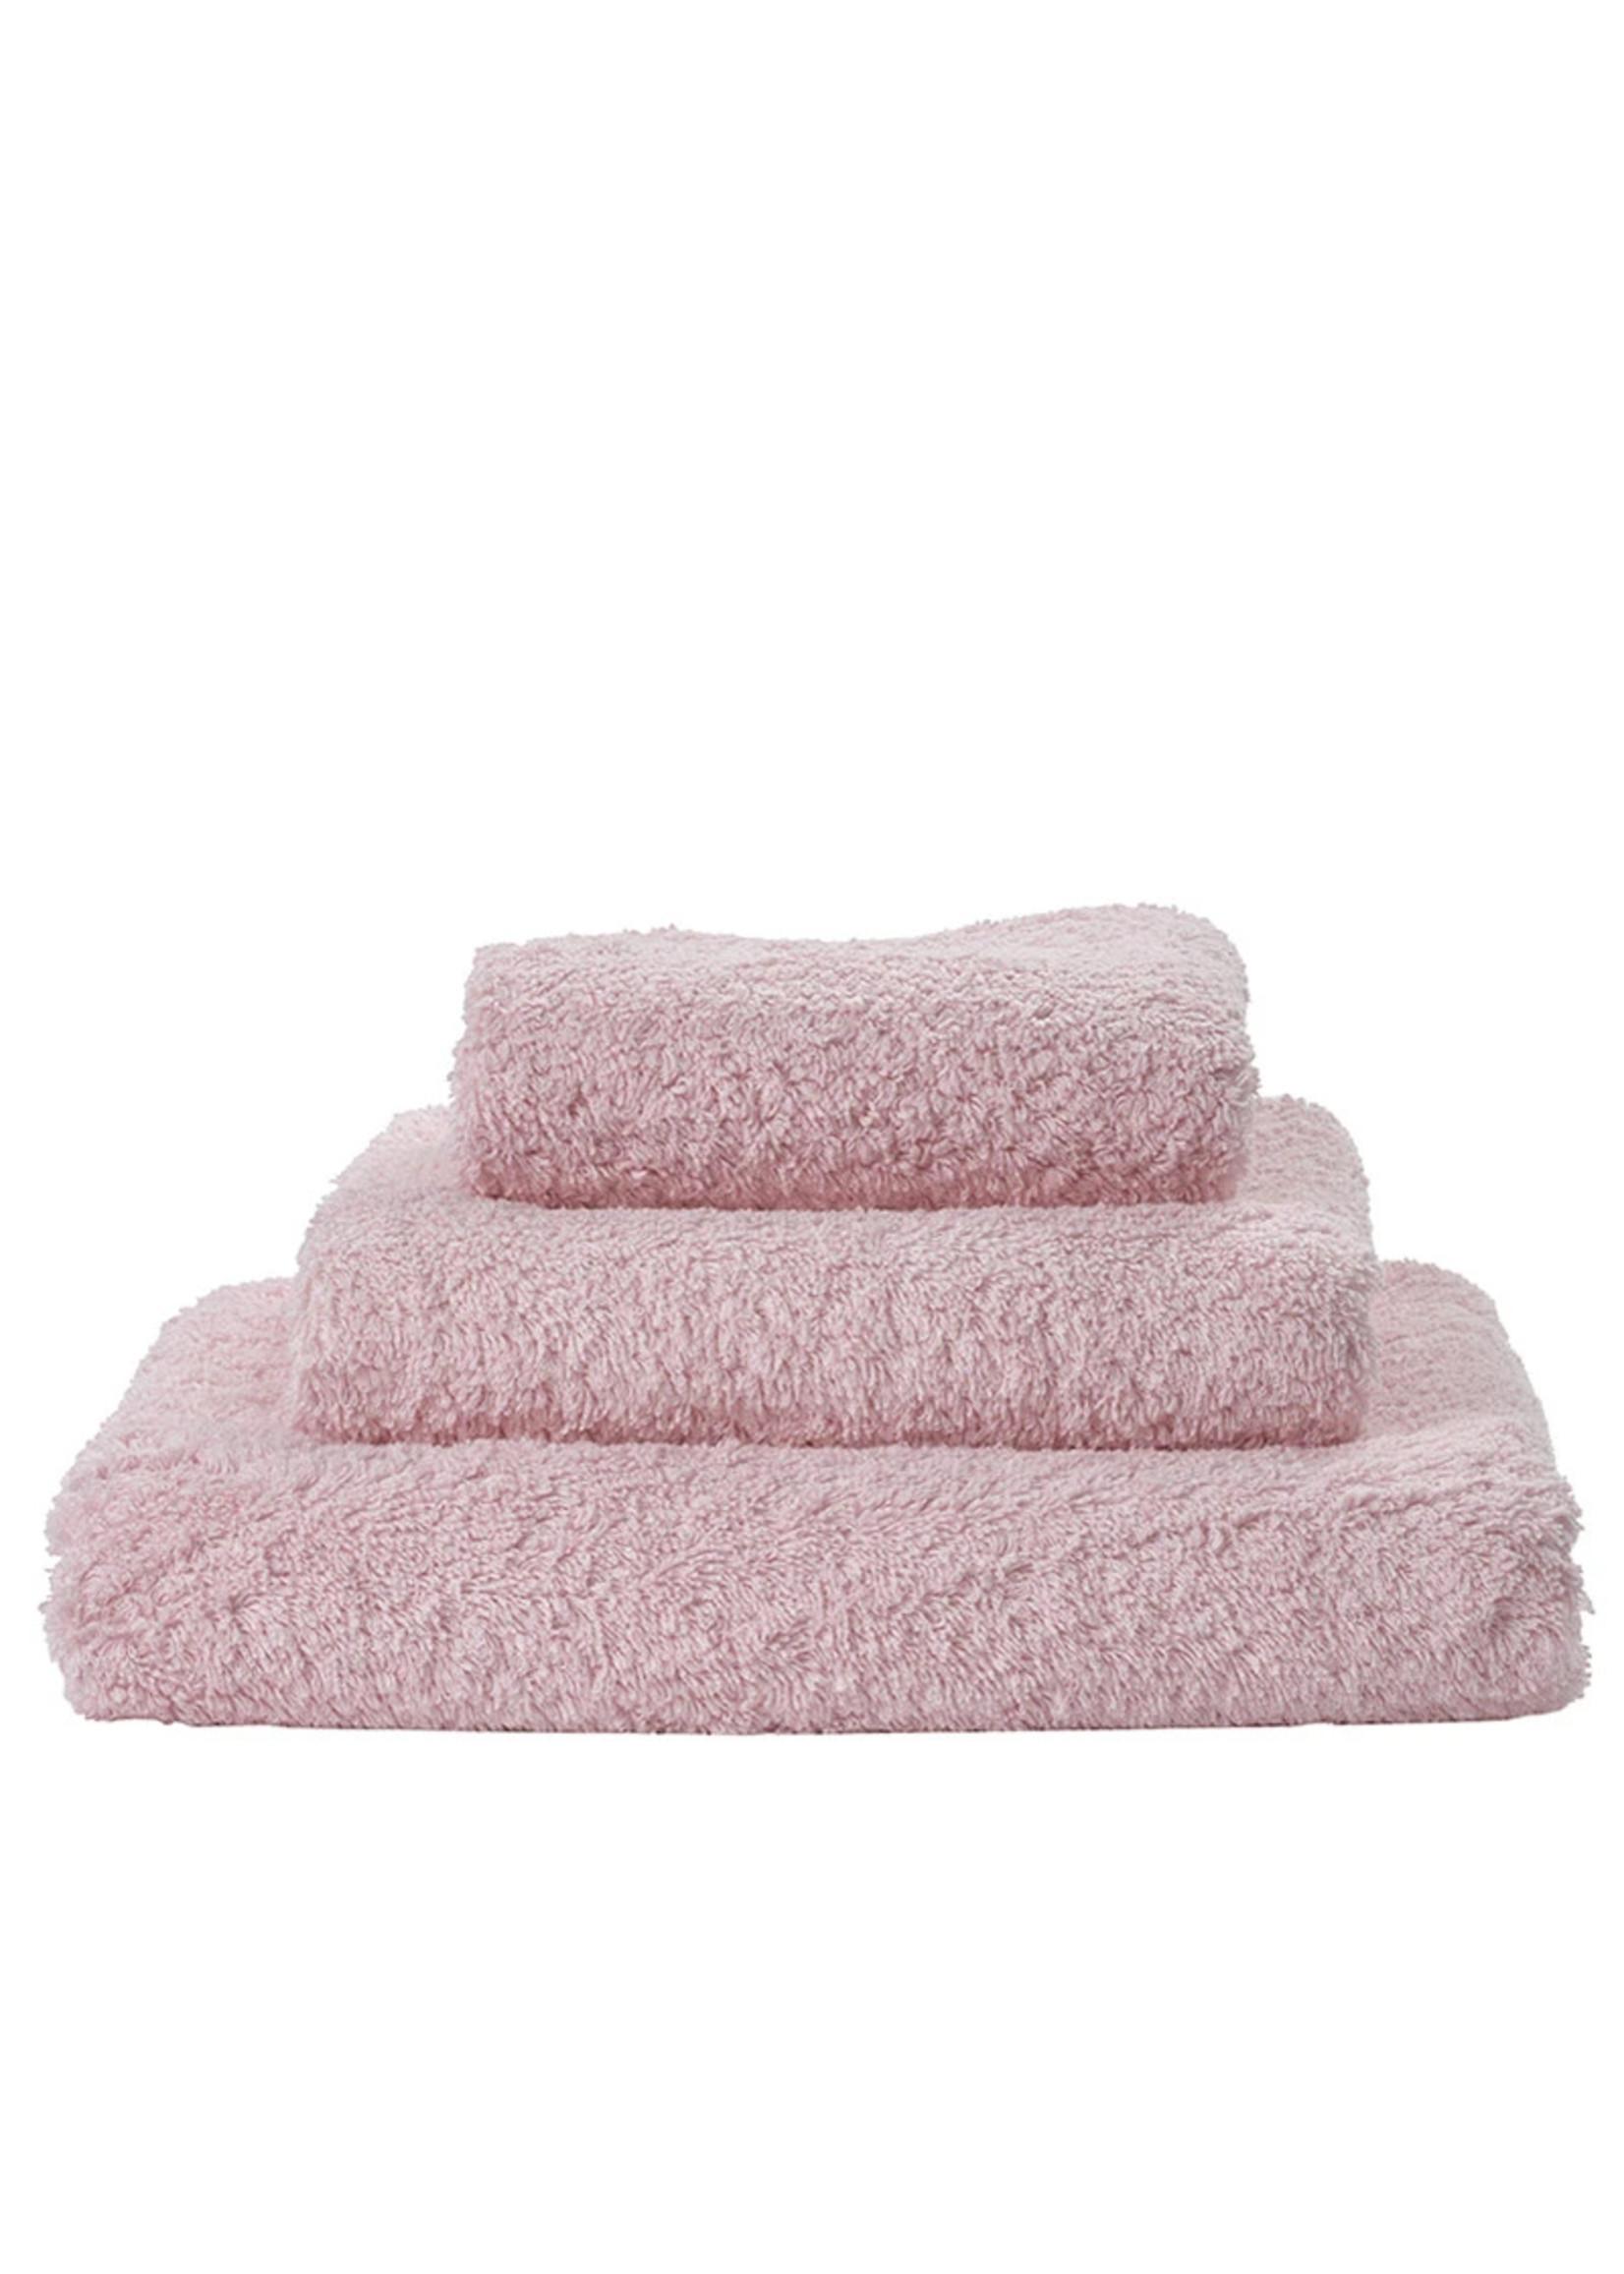 Abyss & Habidecor Super Pile Primrose Towels